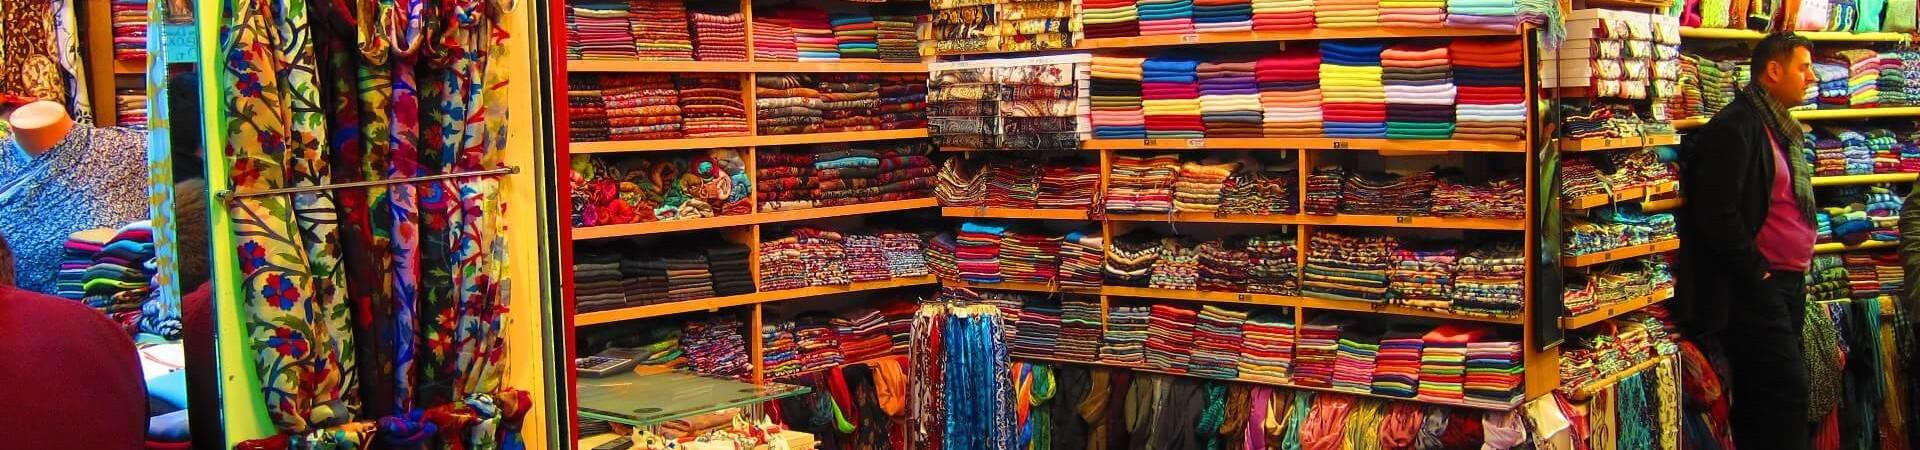 Bazar z ubraniami